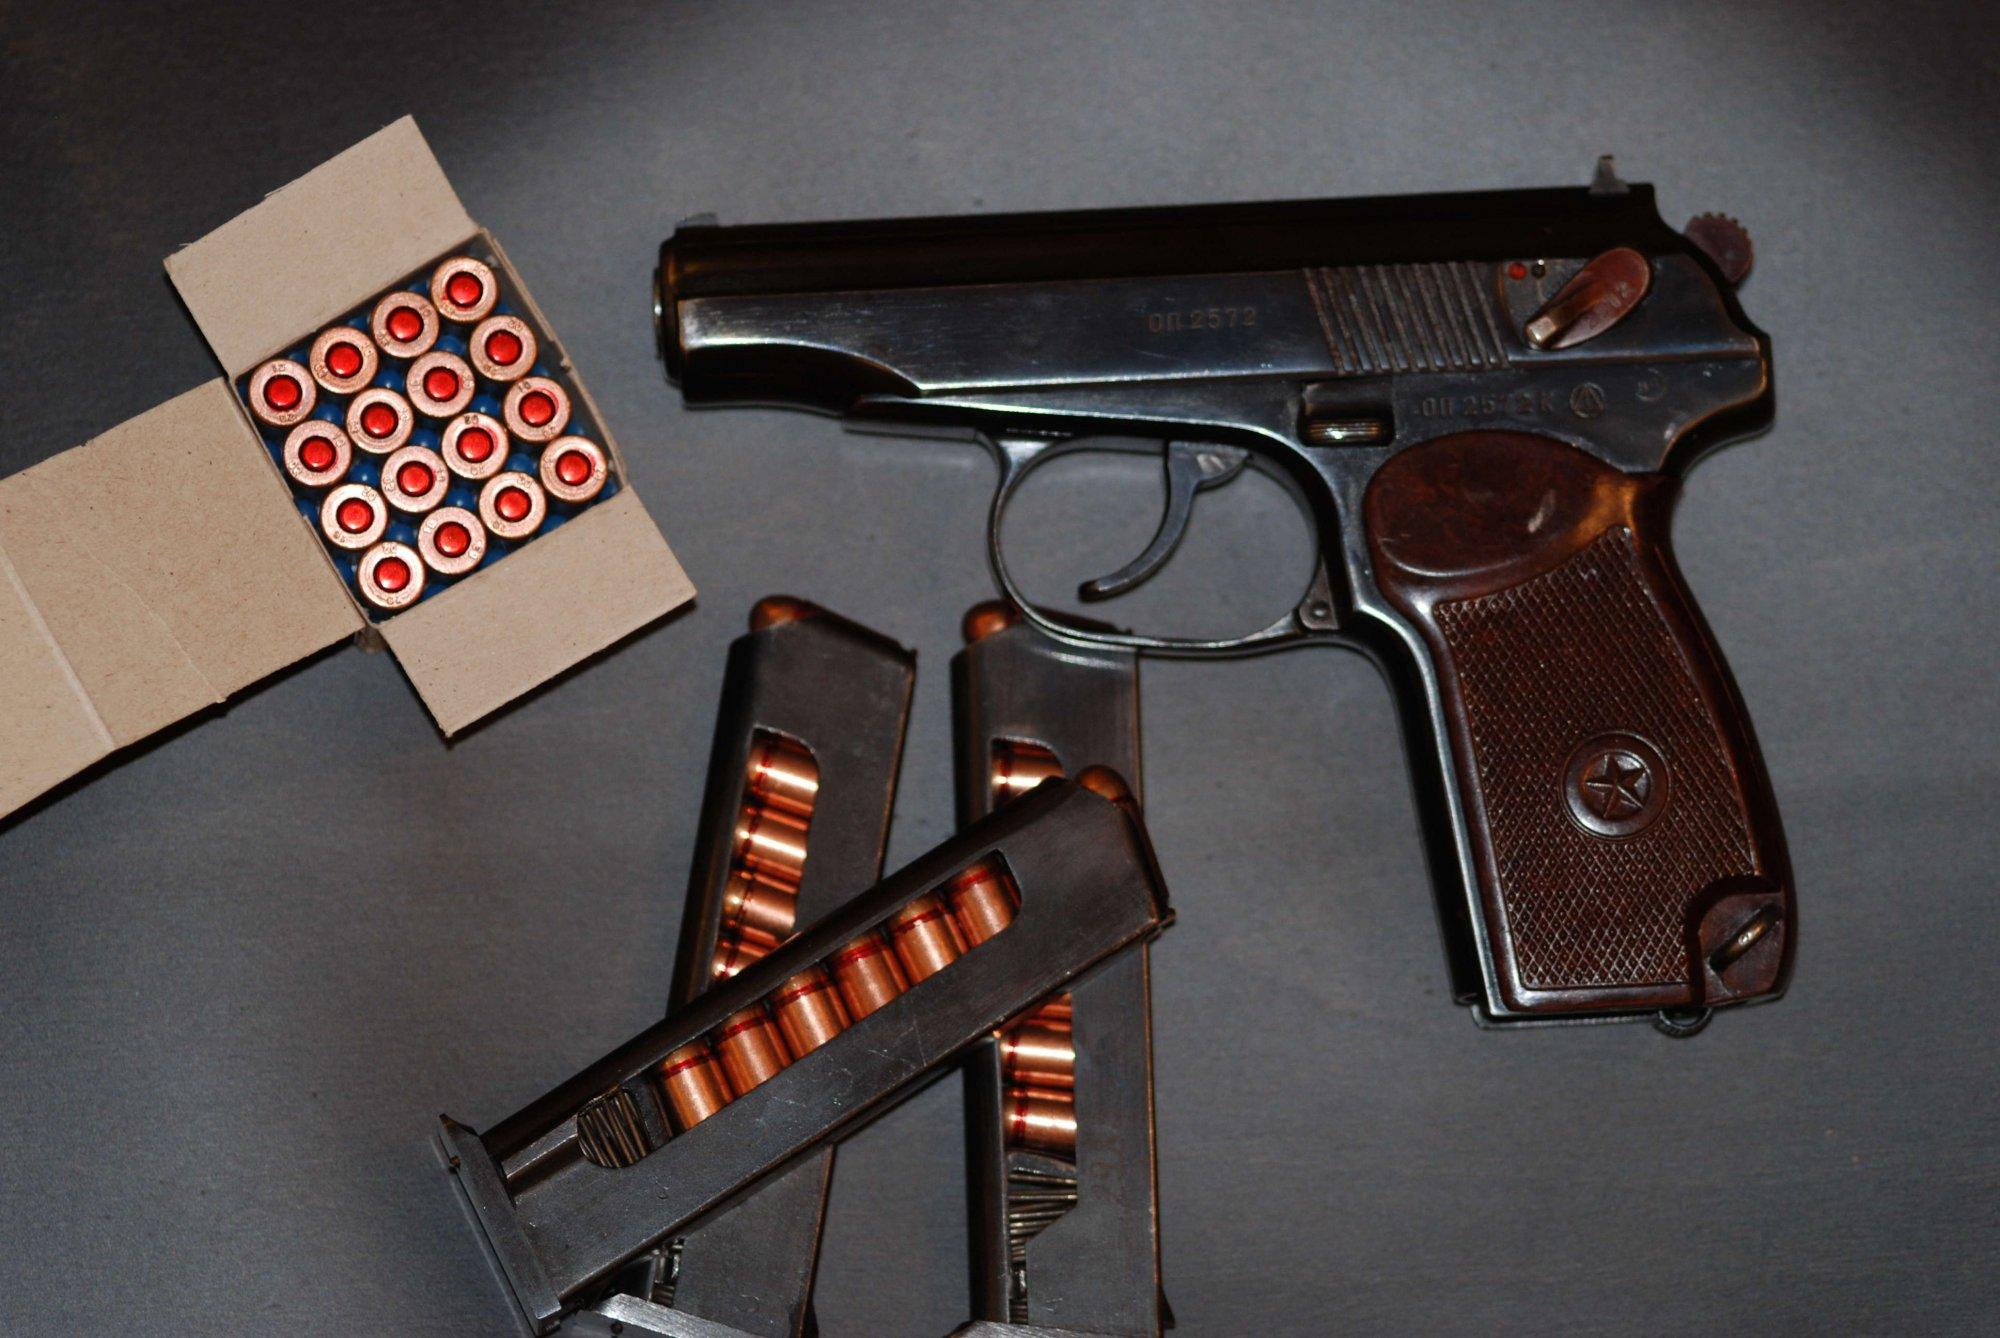 части пистолета системы макарова схема